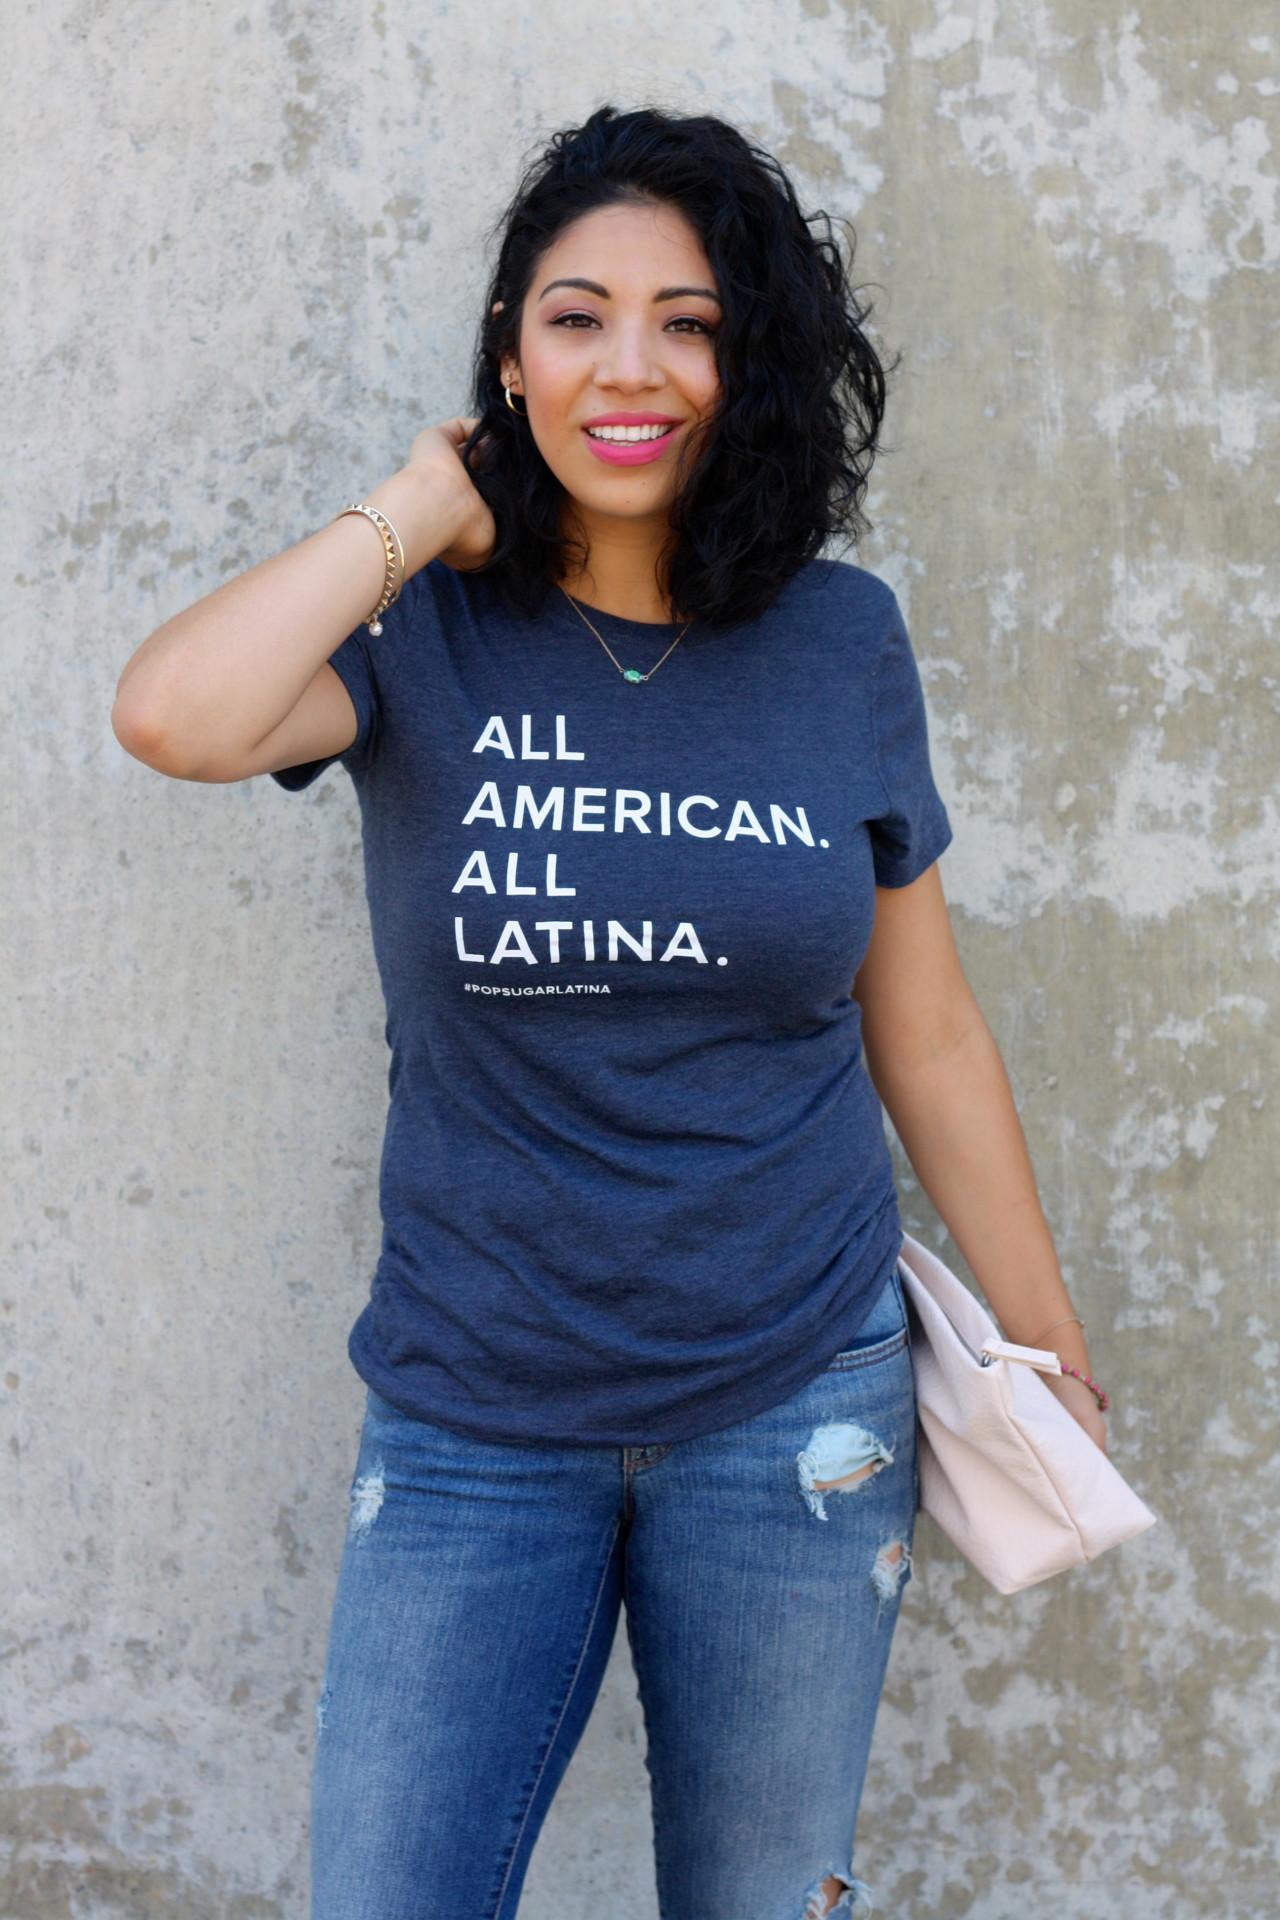 All latina pics